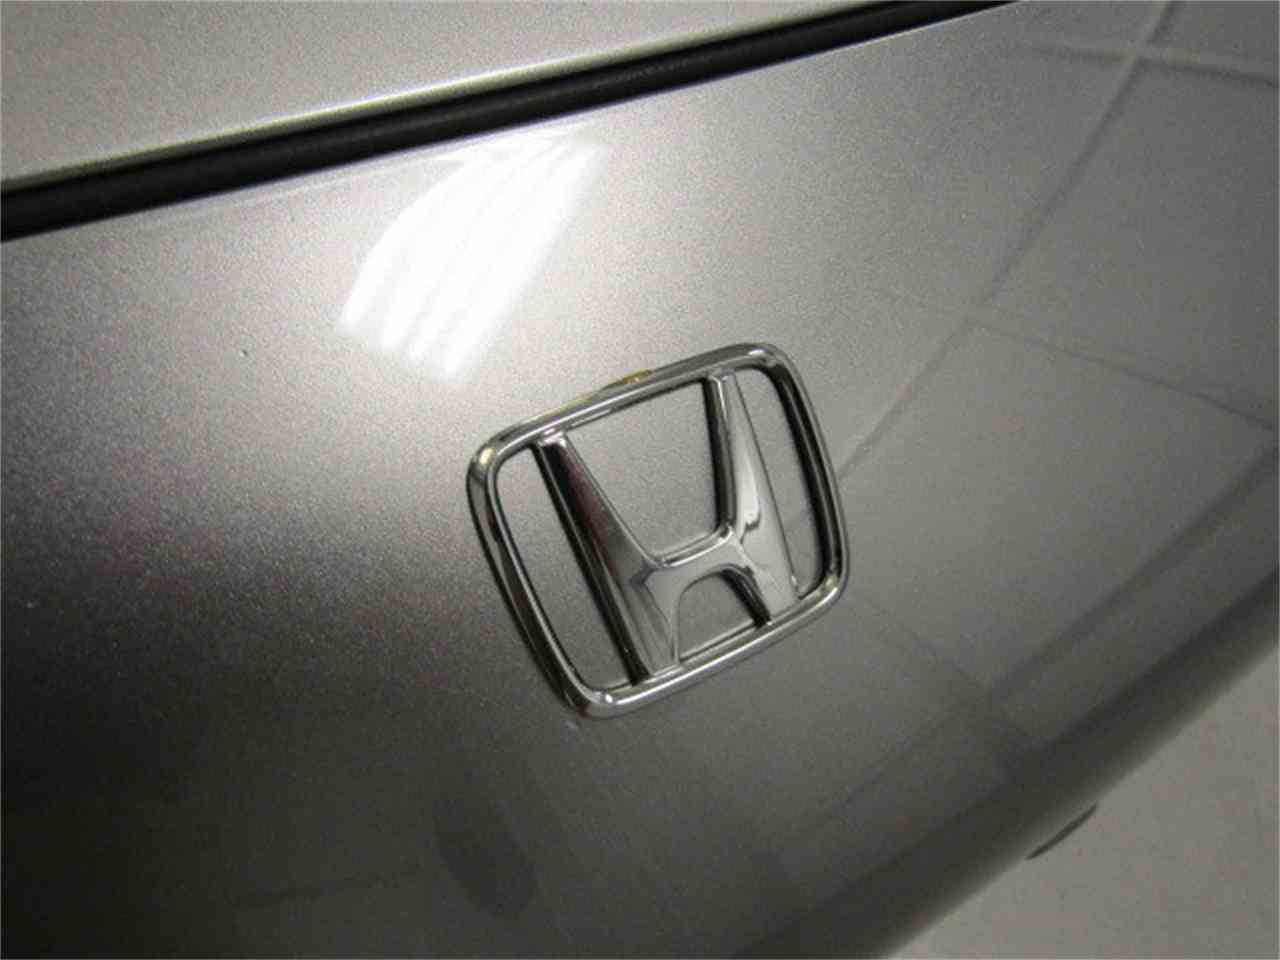 Large Picture of 2001 Honda S2000 located in Christiansburg Virginia - LI1R